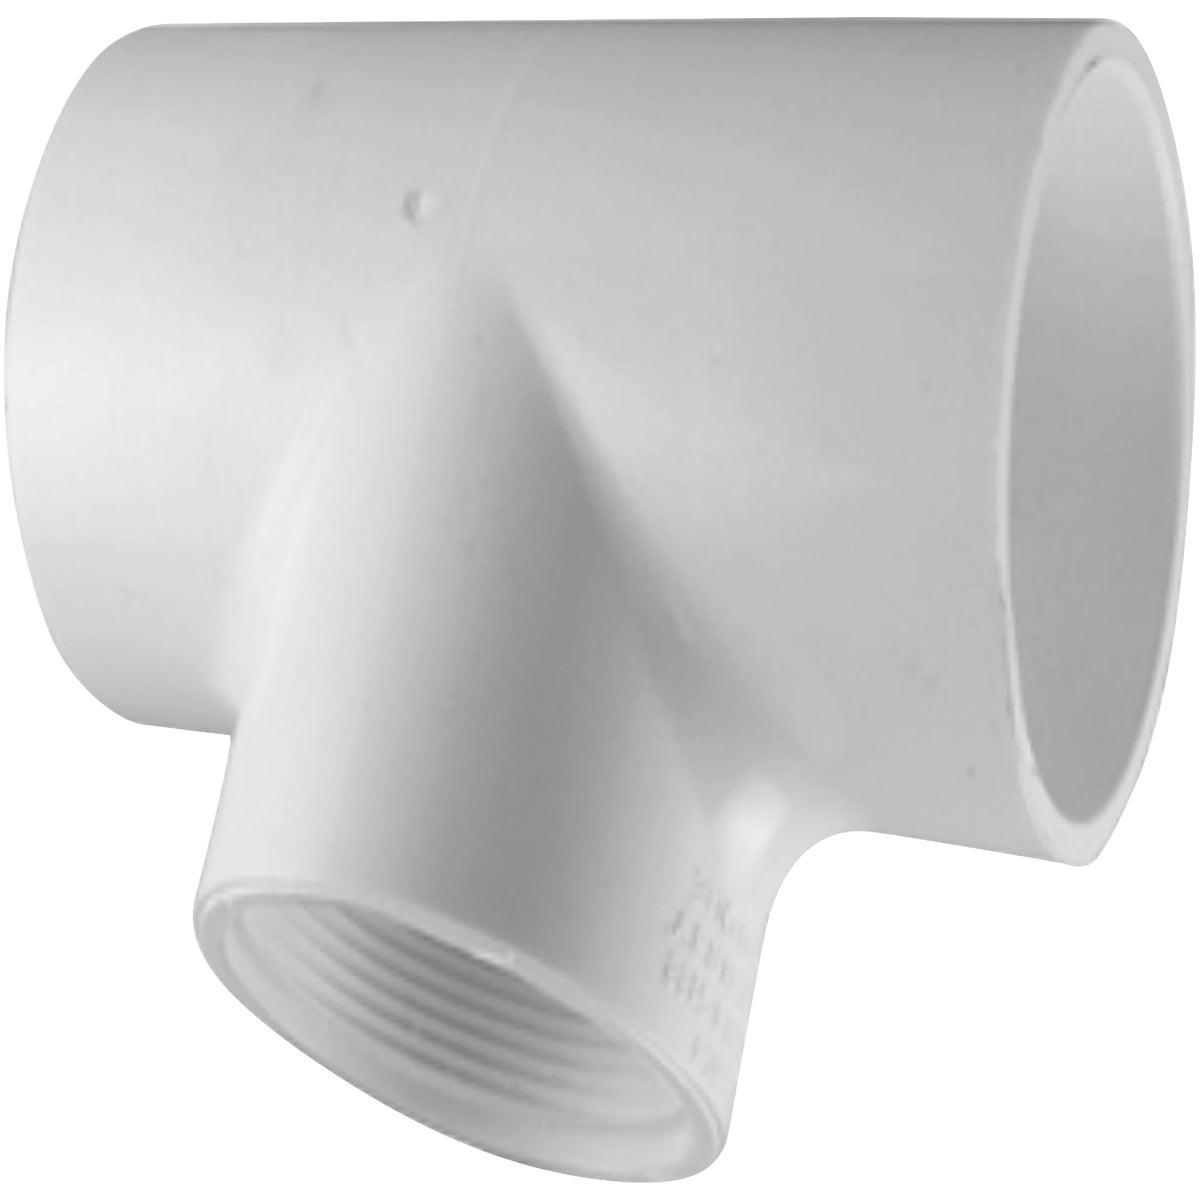 "2"" SCH40 PVC SXFIP TEE - 31452 by Genova Inc"